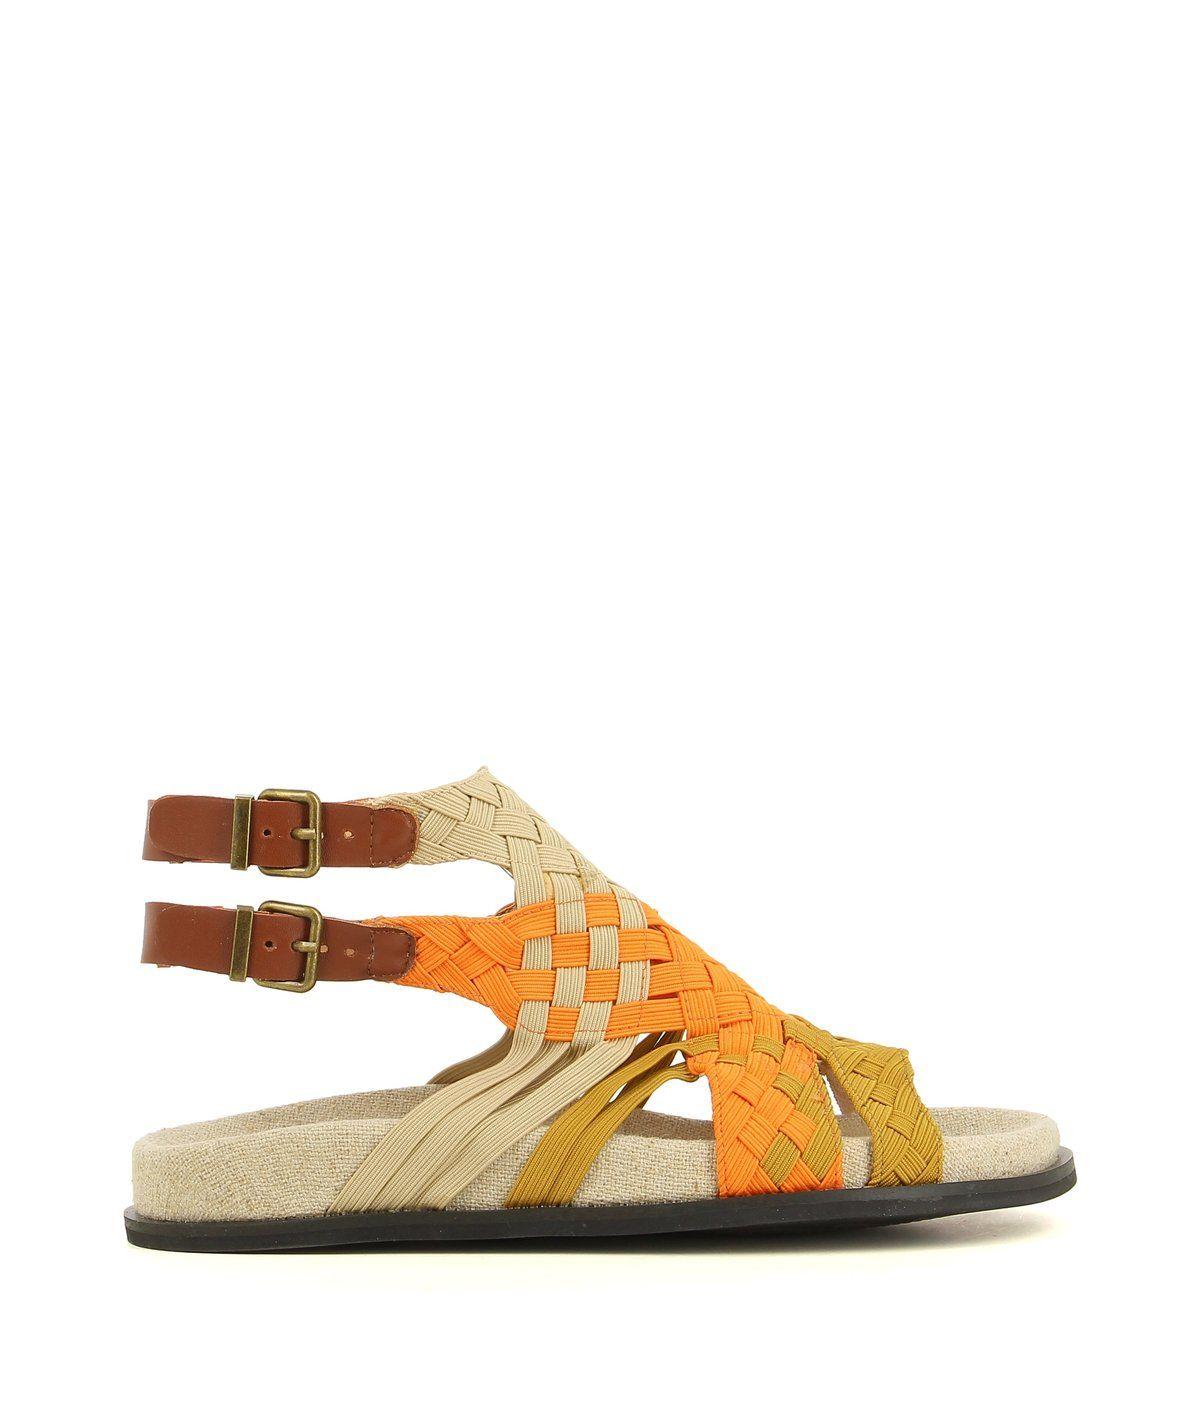 2 Baia Vista Velda Brown Multi Zomp Shoez Sandals Ankle Strap Flat Sandals